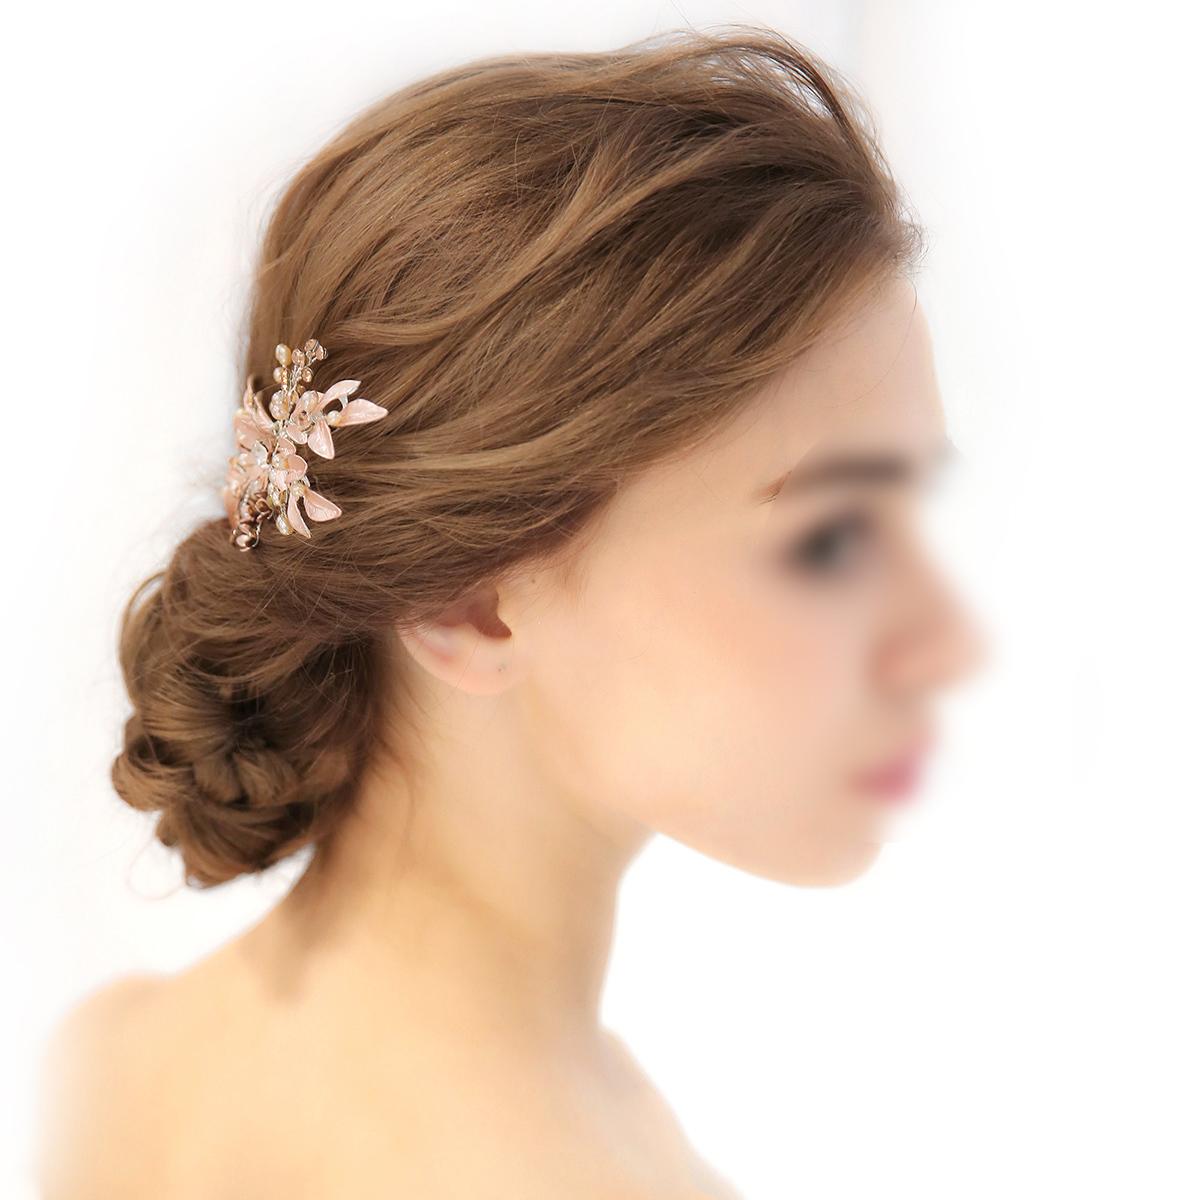 Bride Headdress Hair Clip Crystal Bridal Pearl Hair Accessory Headpiece Headwear for Banquet Prom Engagement Party Wedding C18110901